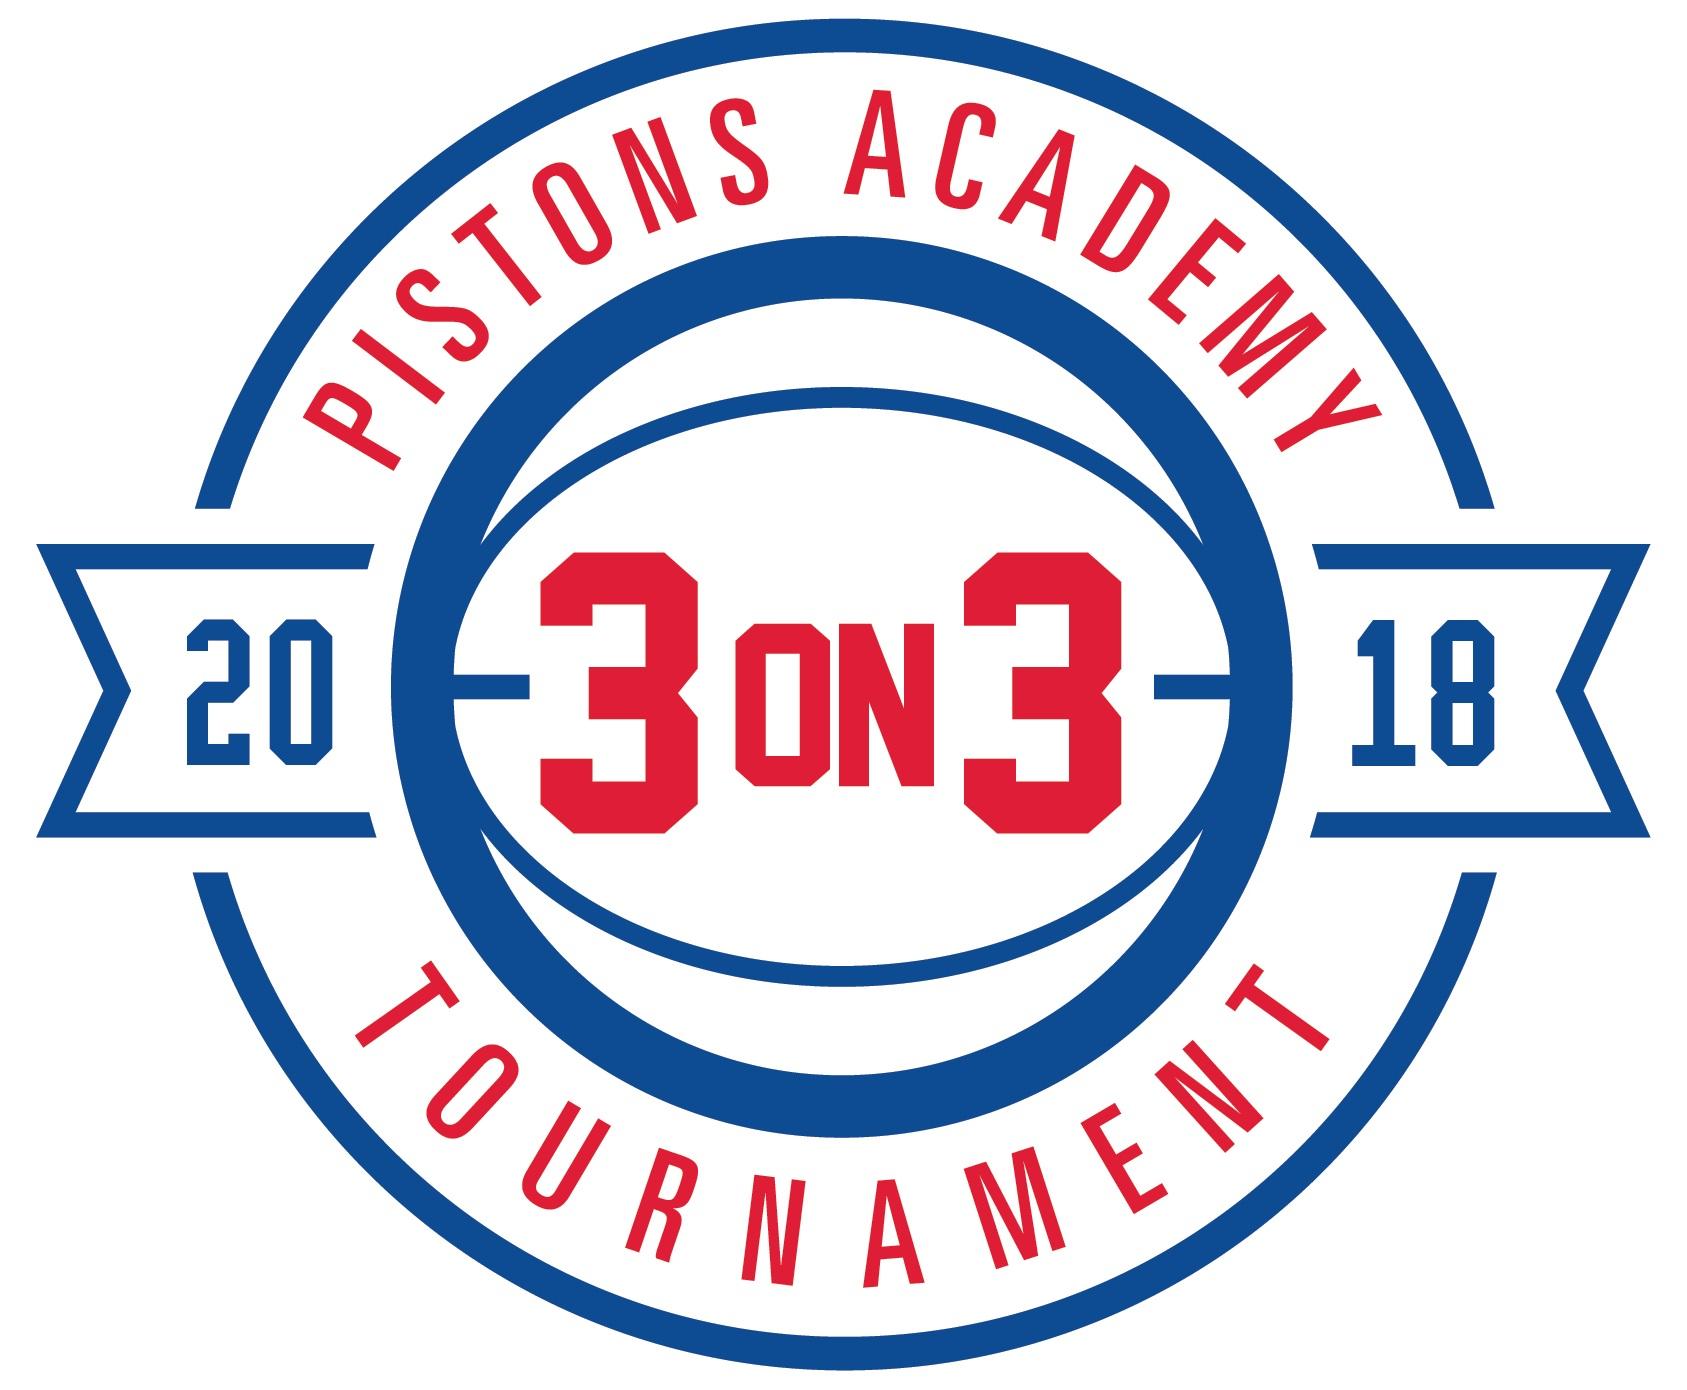 Pistons Academy 3-on-3 Tournament 2018 Logo